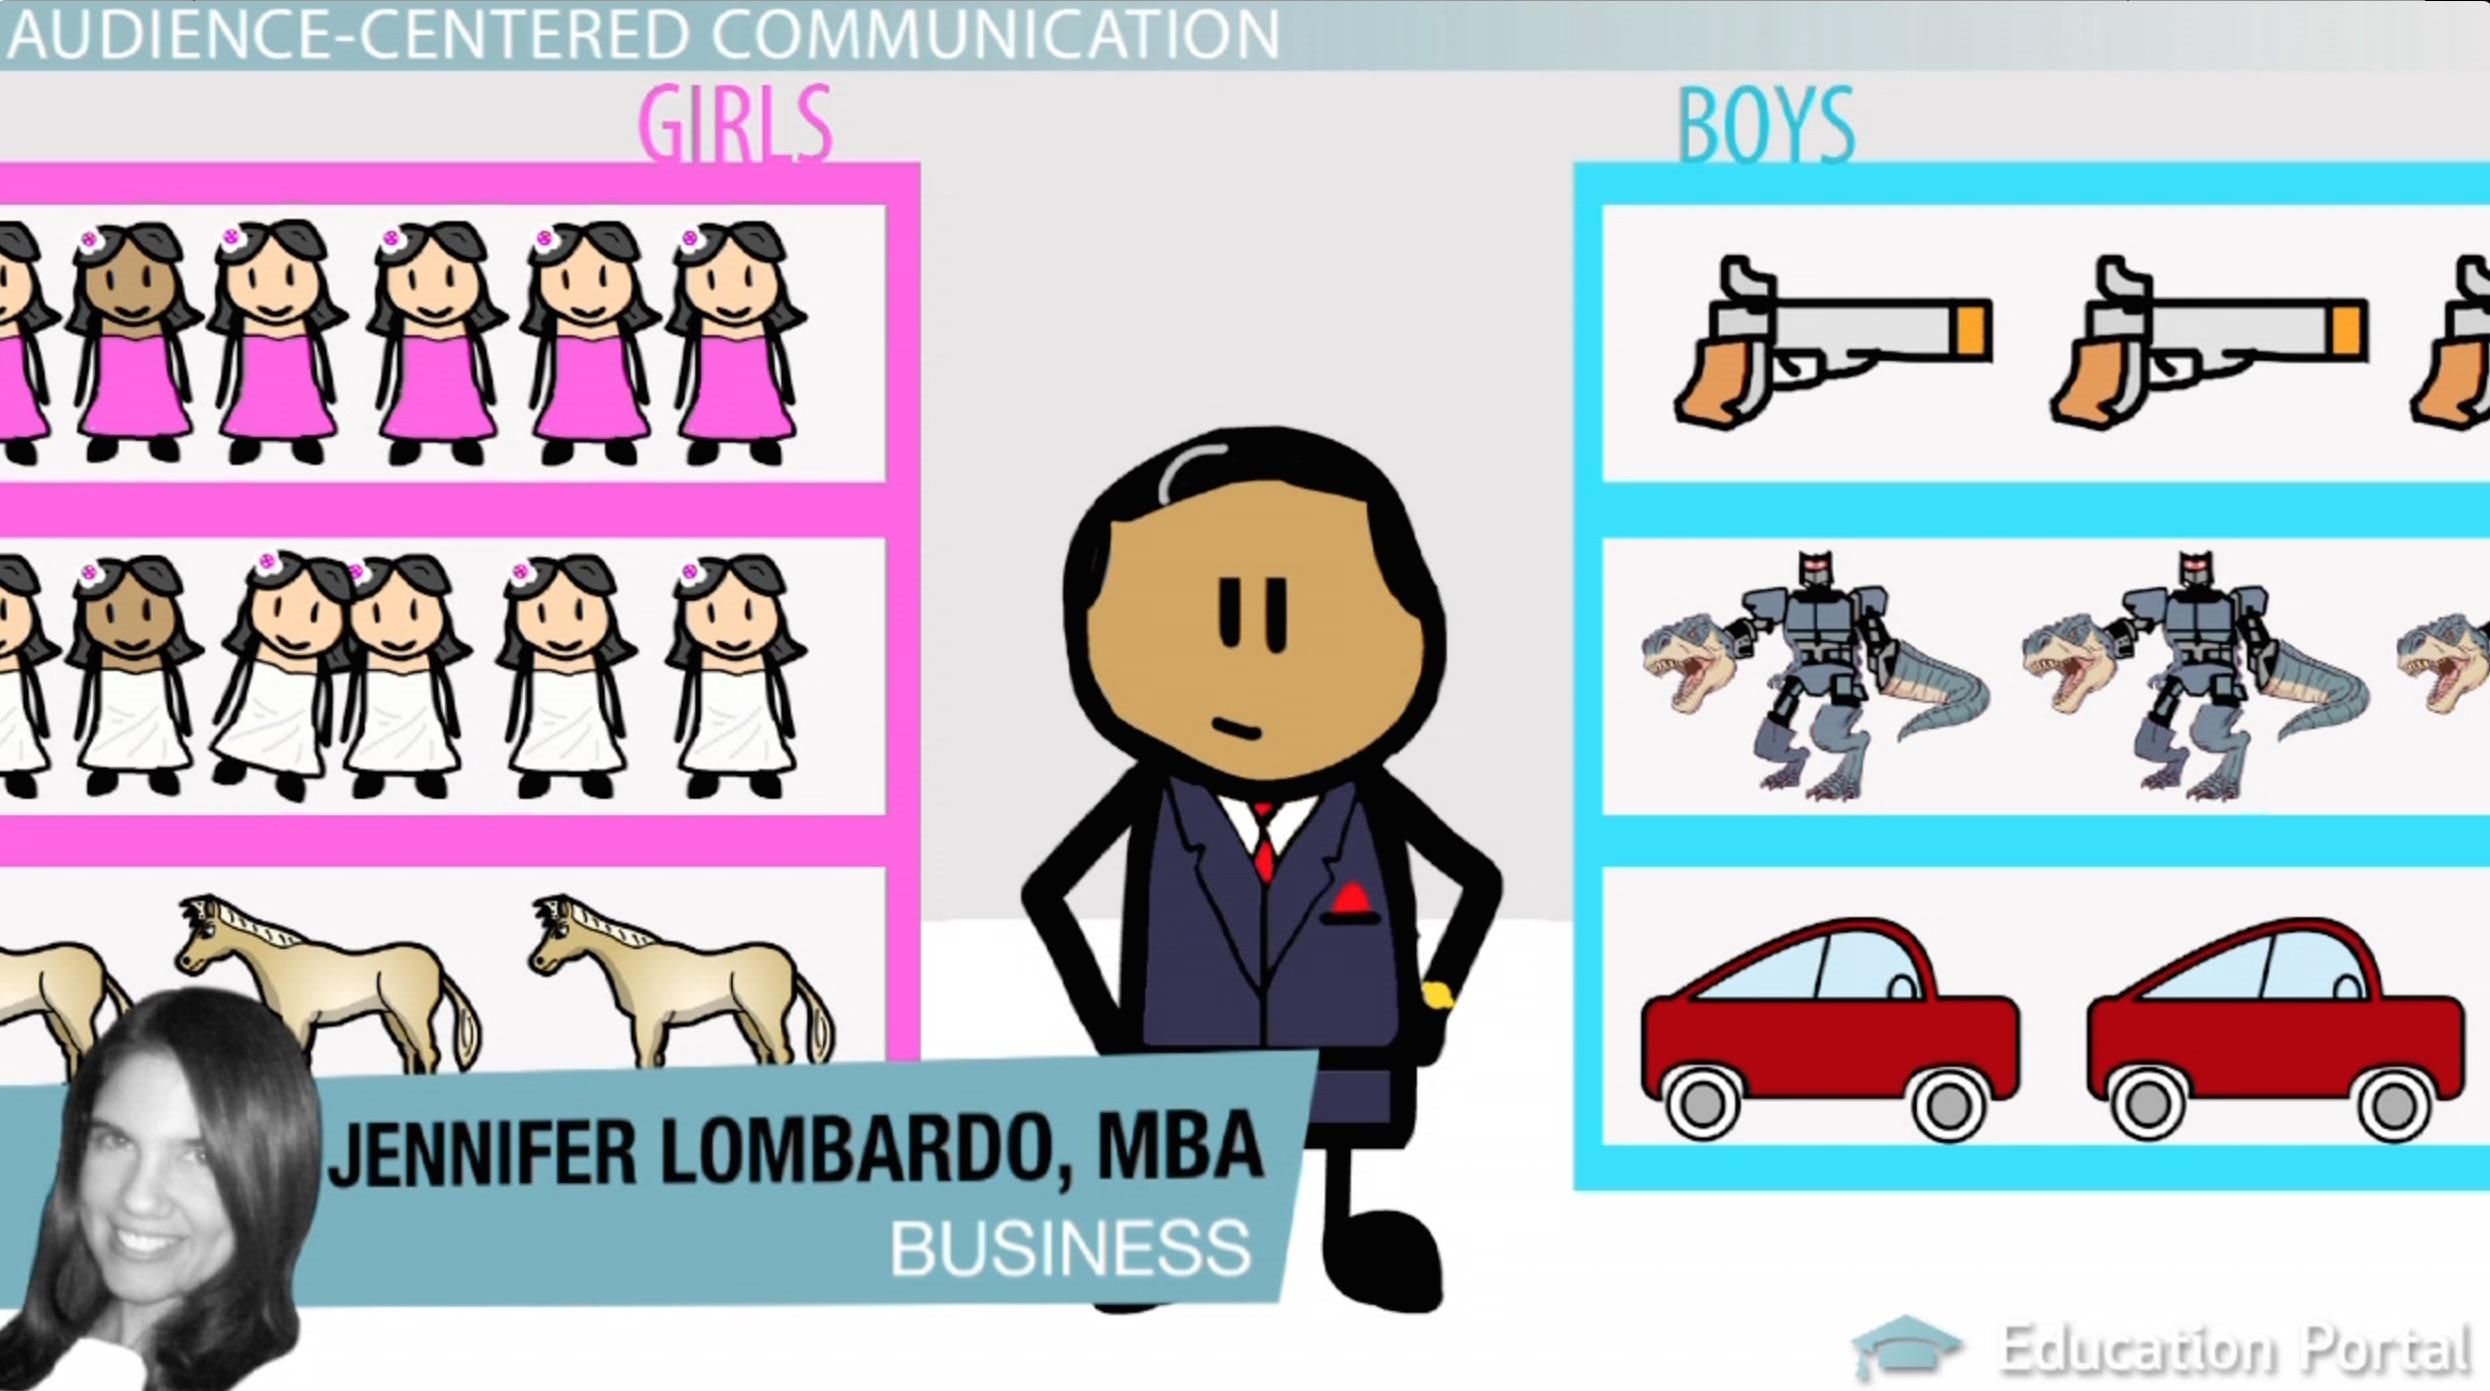 Audience-Centered Communication: Description & Effectiveness Video